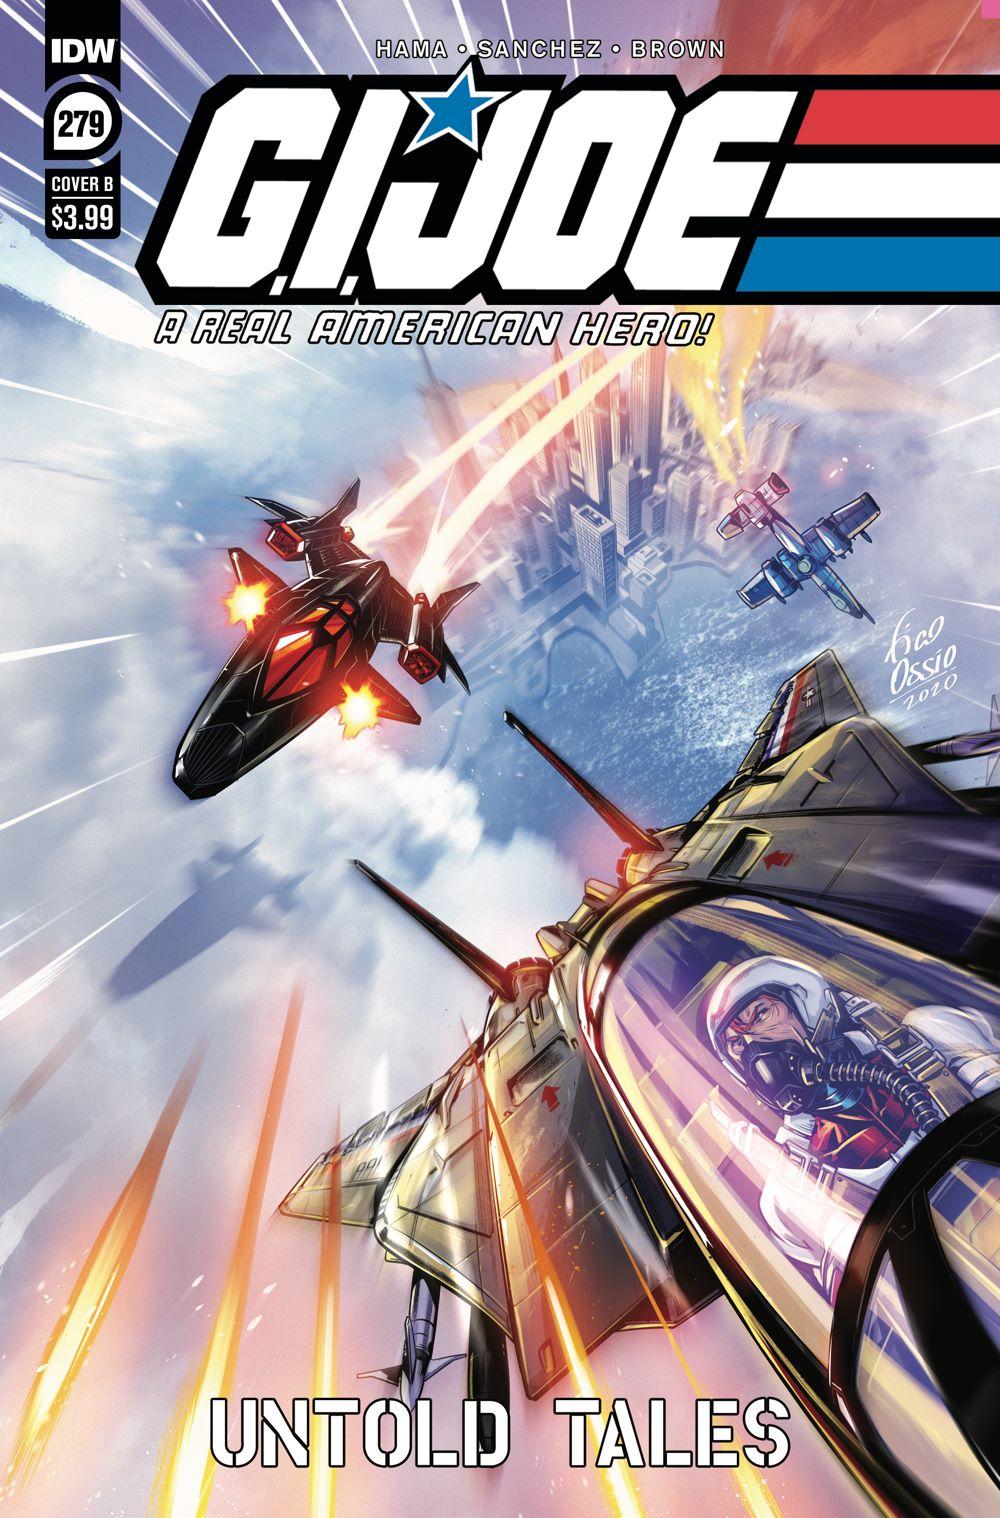 GIJoeRAH279-coverB ComicList Previews: G.I. JOE A REAL AMERICAN HERO #279